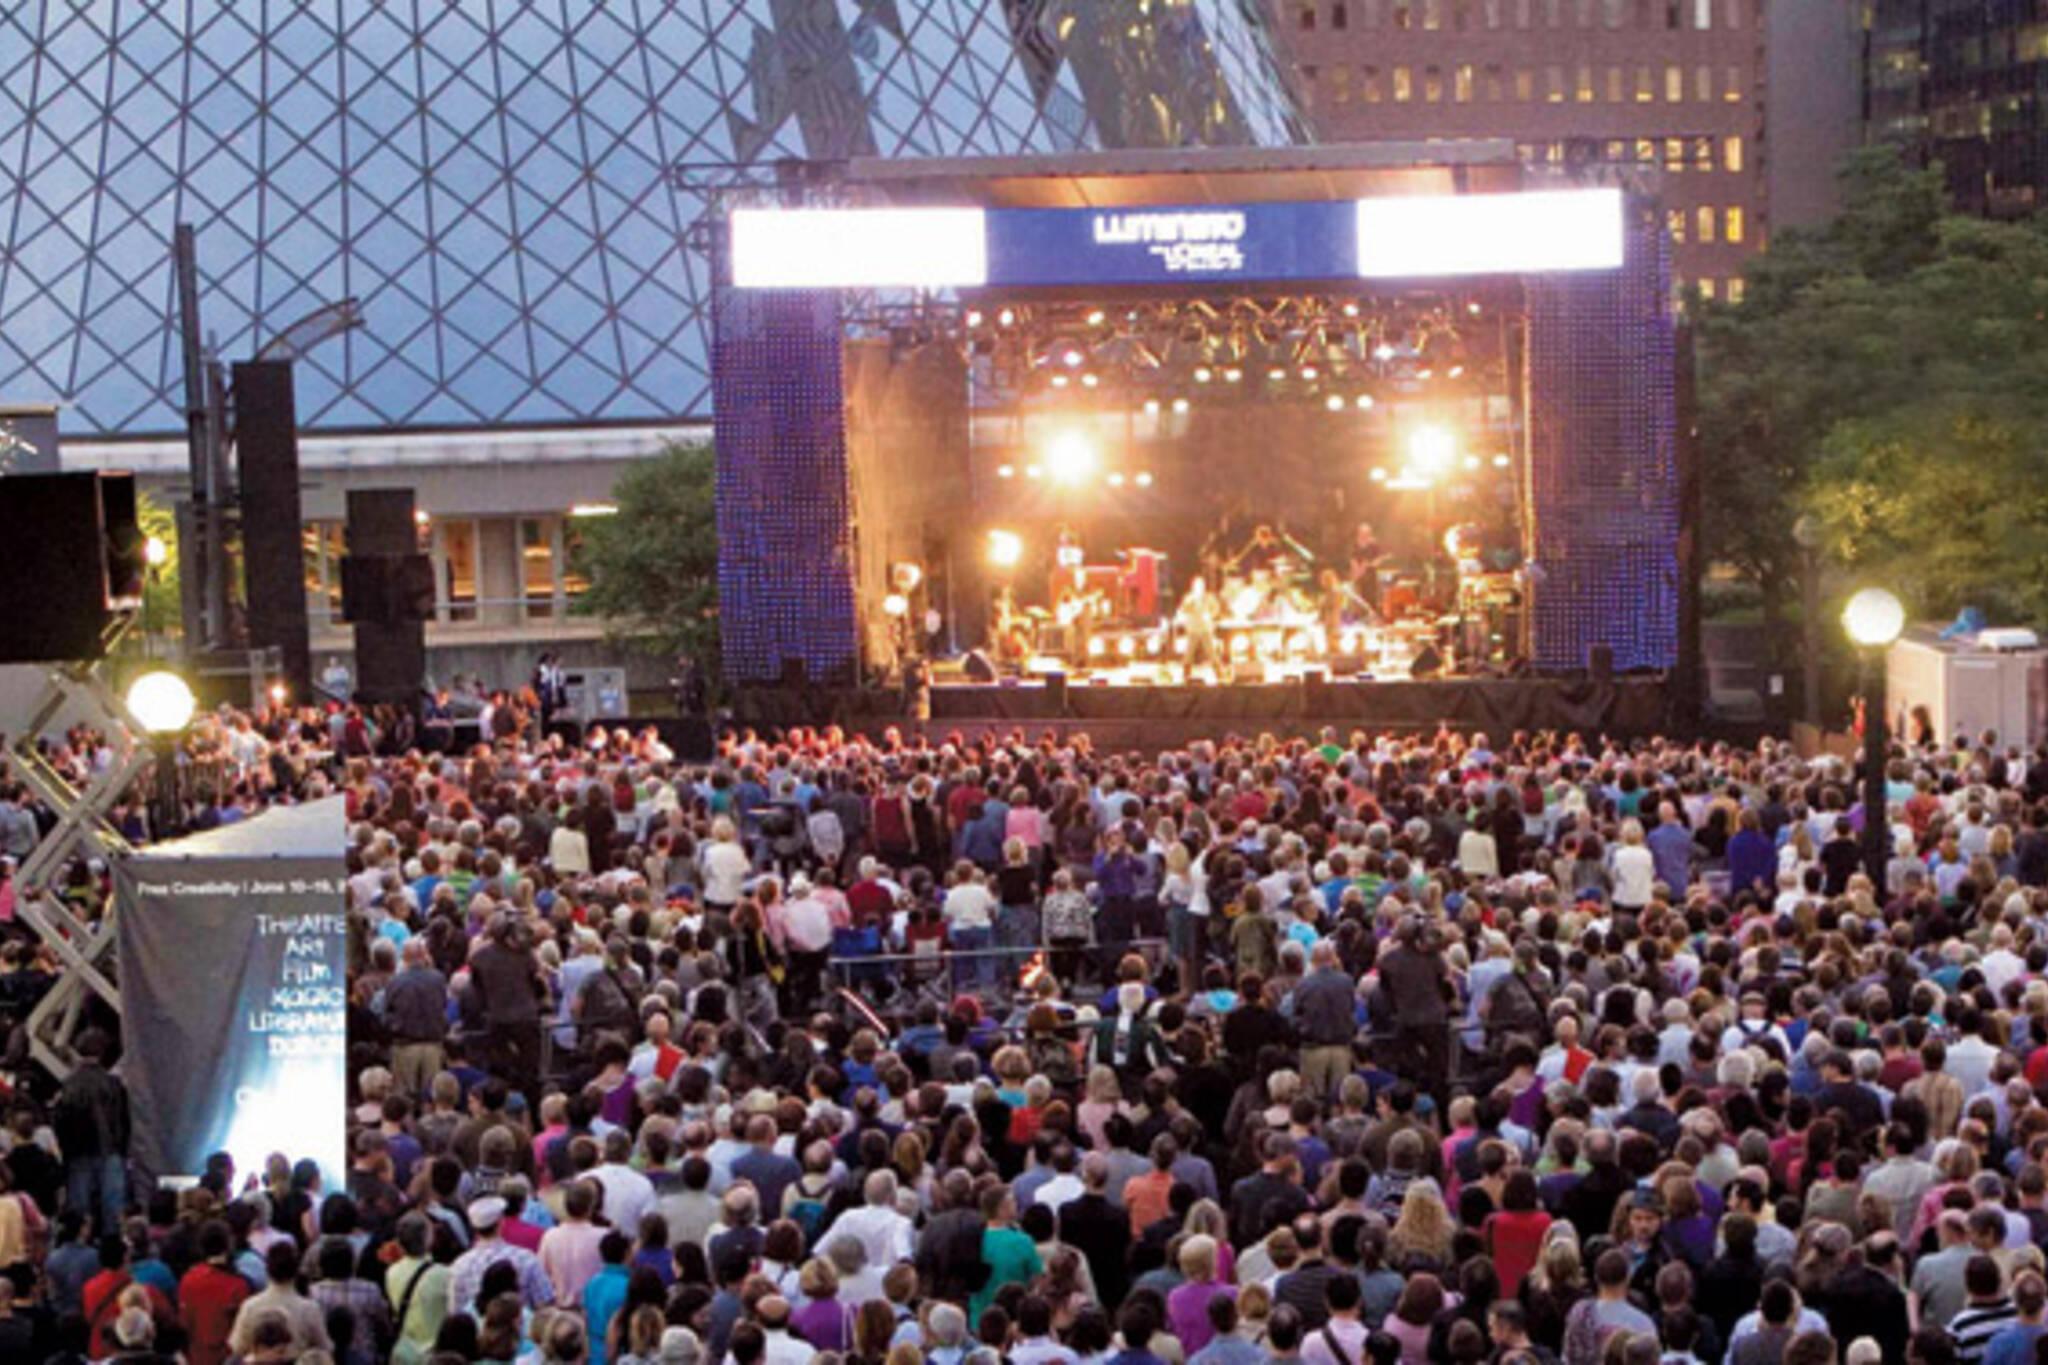 Luminato Festival Toronto 2012